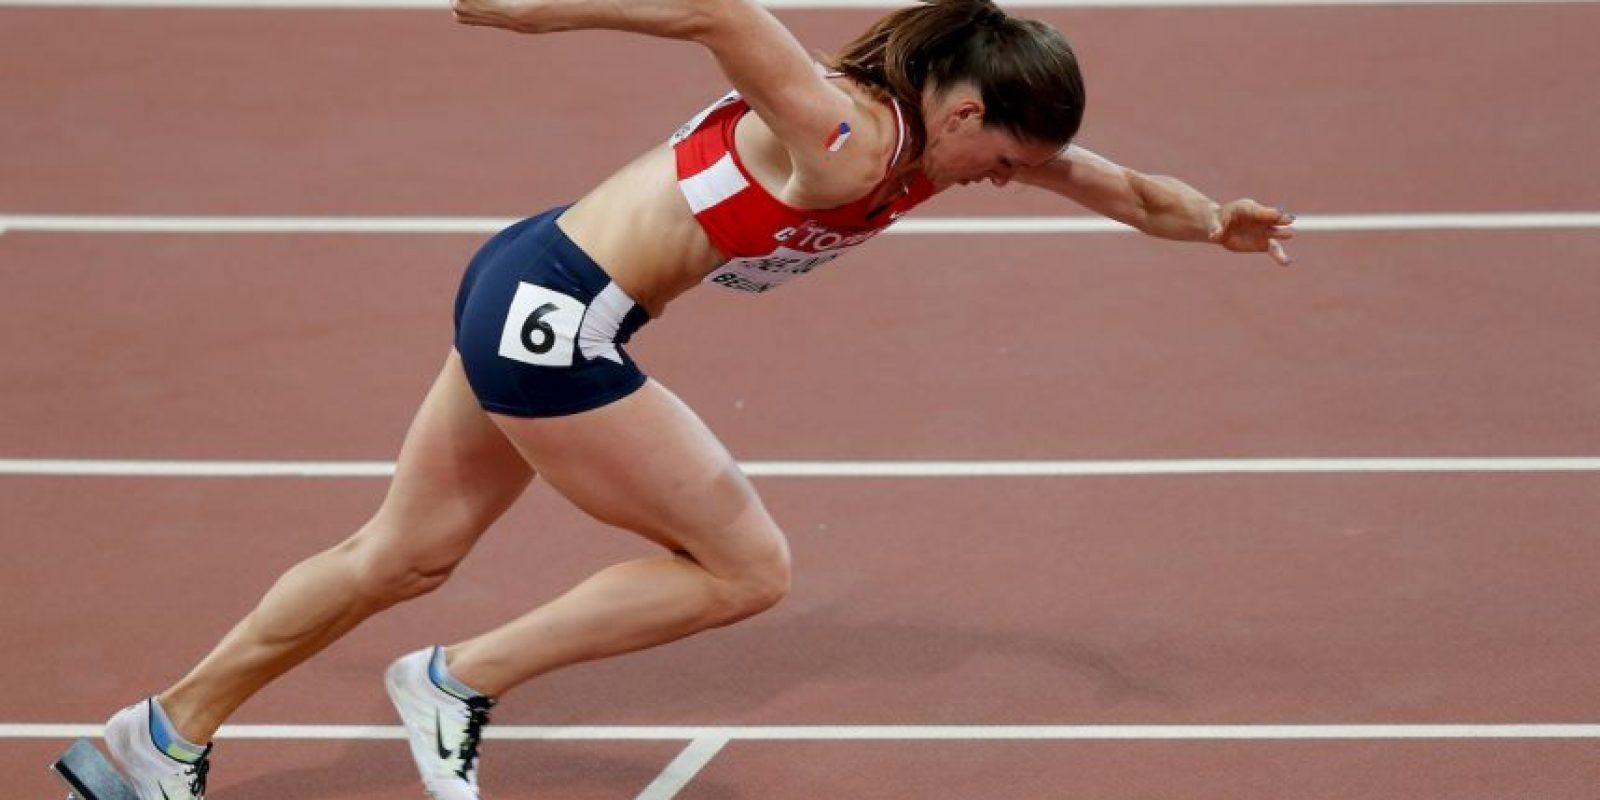 Zuzana Hejnova Foto:Getty Images